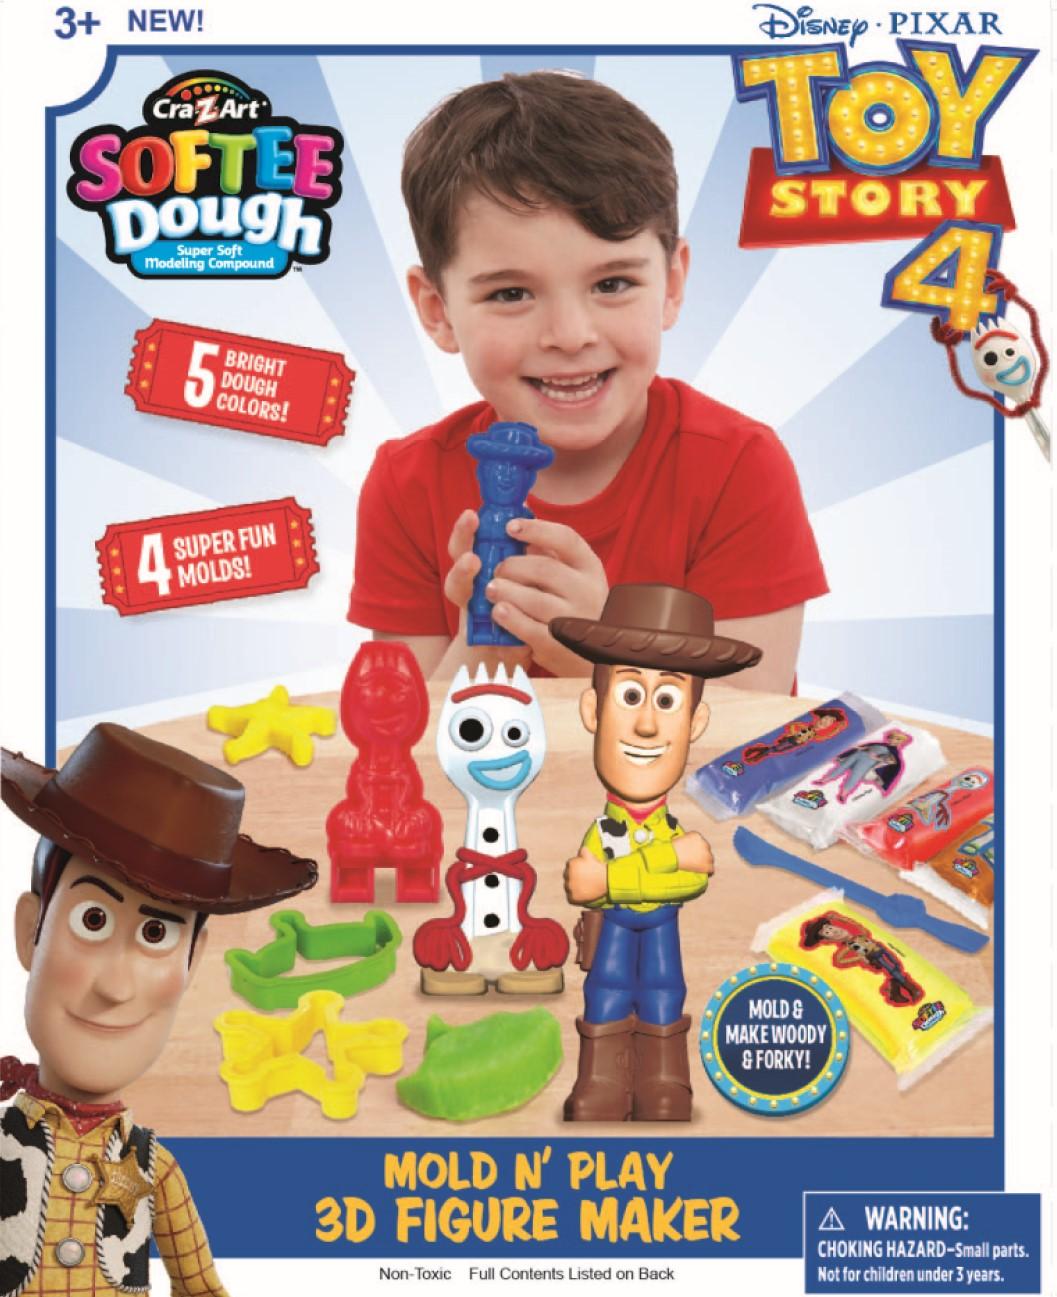 Disney Toy Story 4 Softee Dough Mold n Play 3D Fig